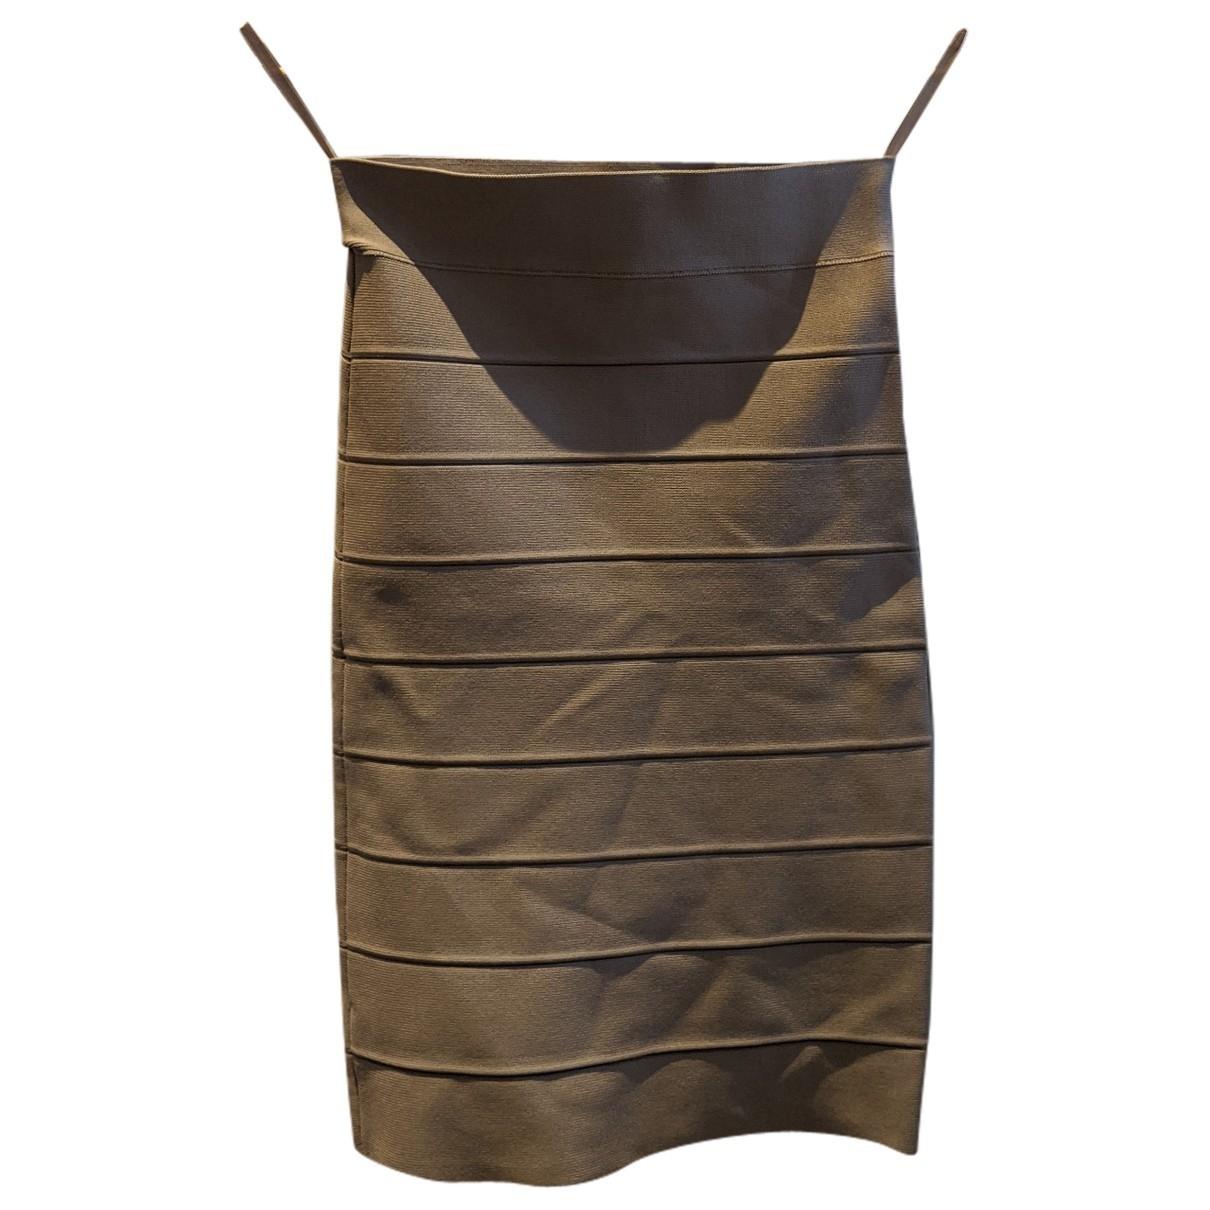 Bcbg Max Azria \N Camel Cotton - elasthane skirt for Women XS International